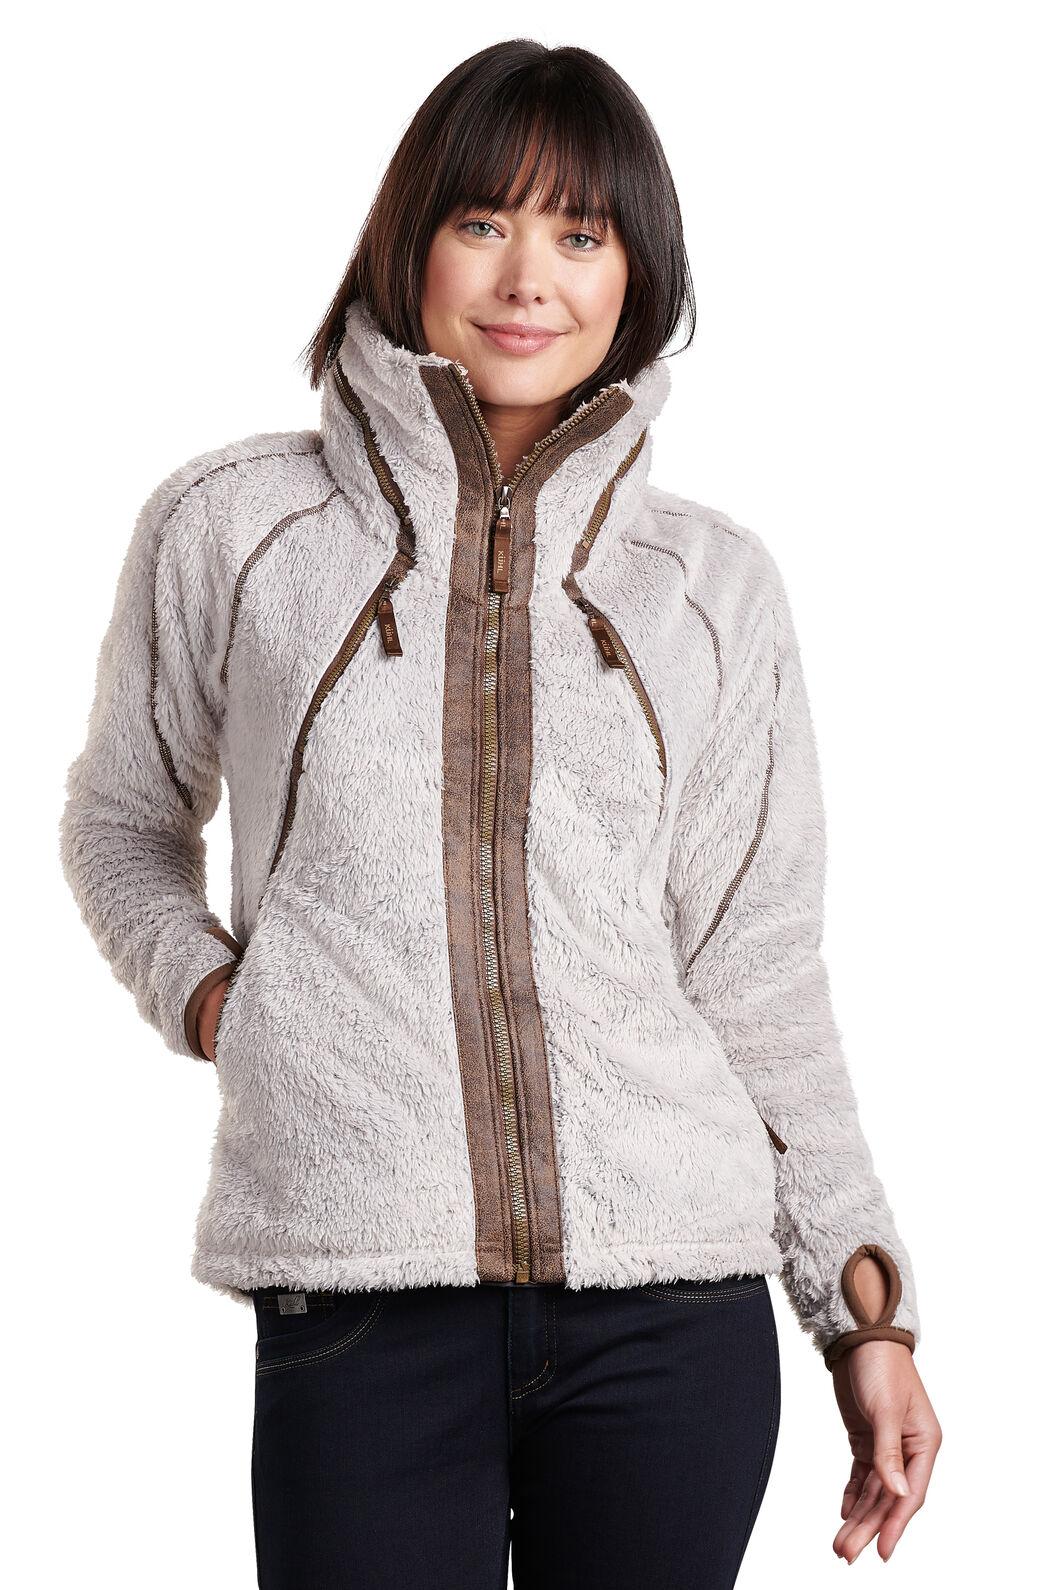 Kuhl Flight Jacket - Women's, Stone, hi-res